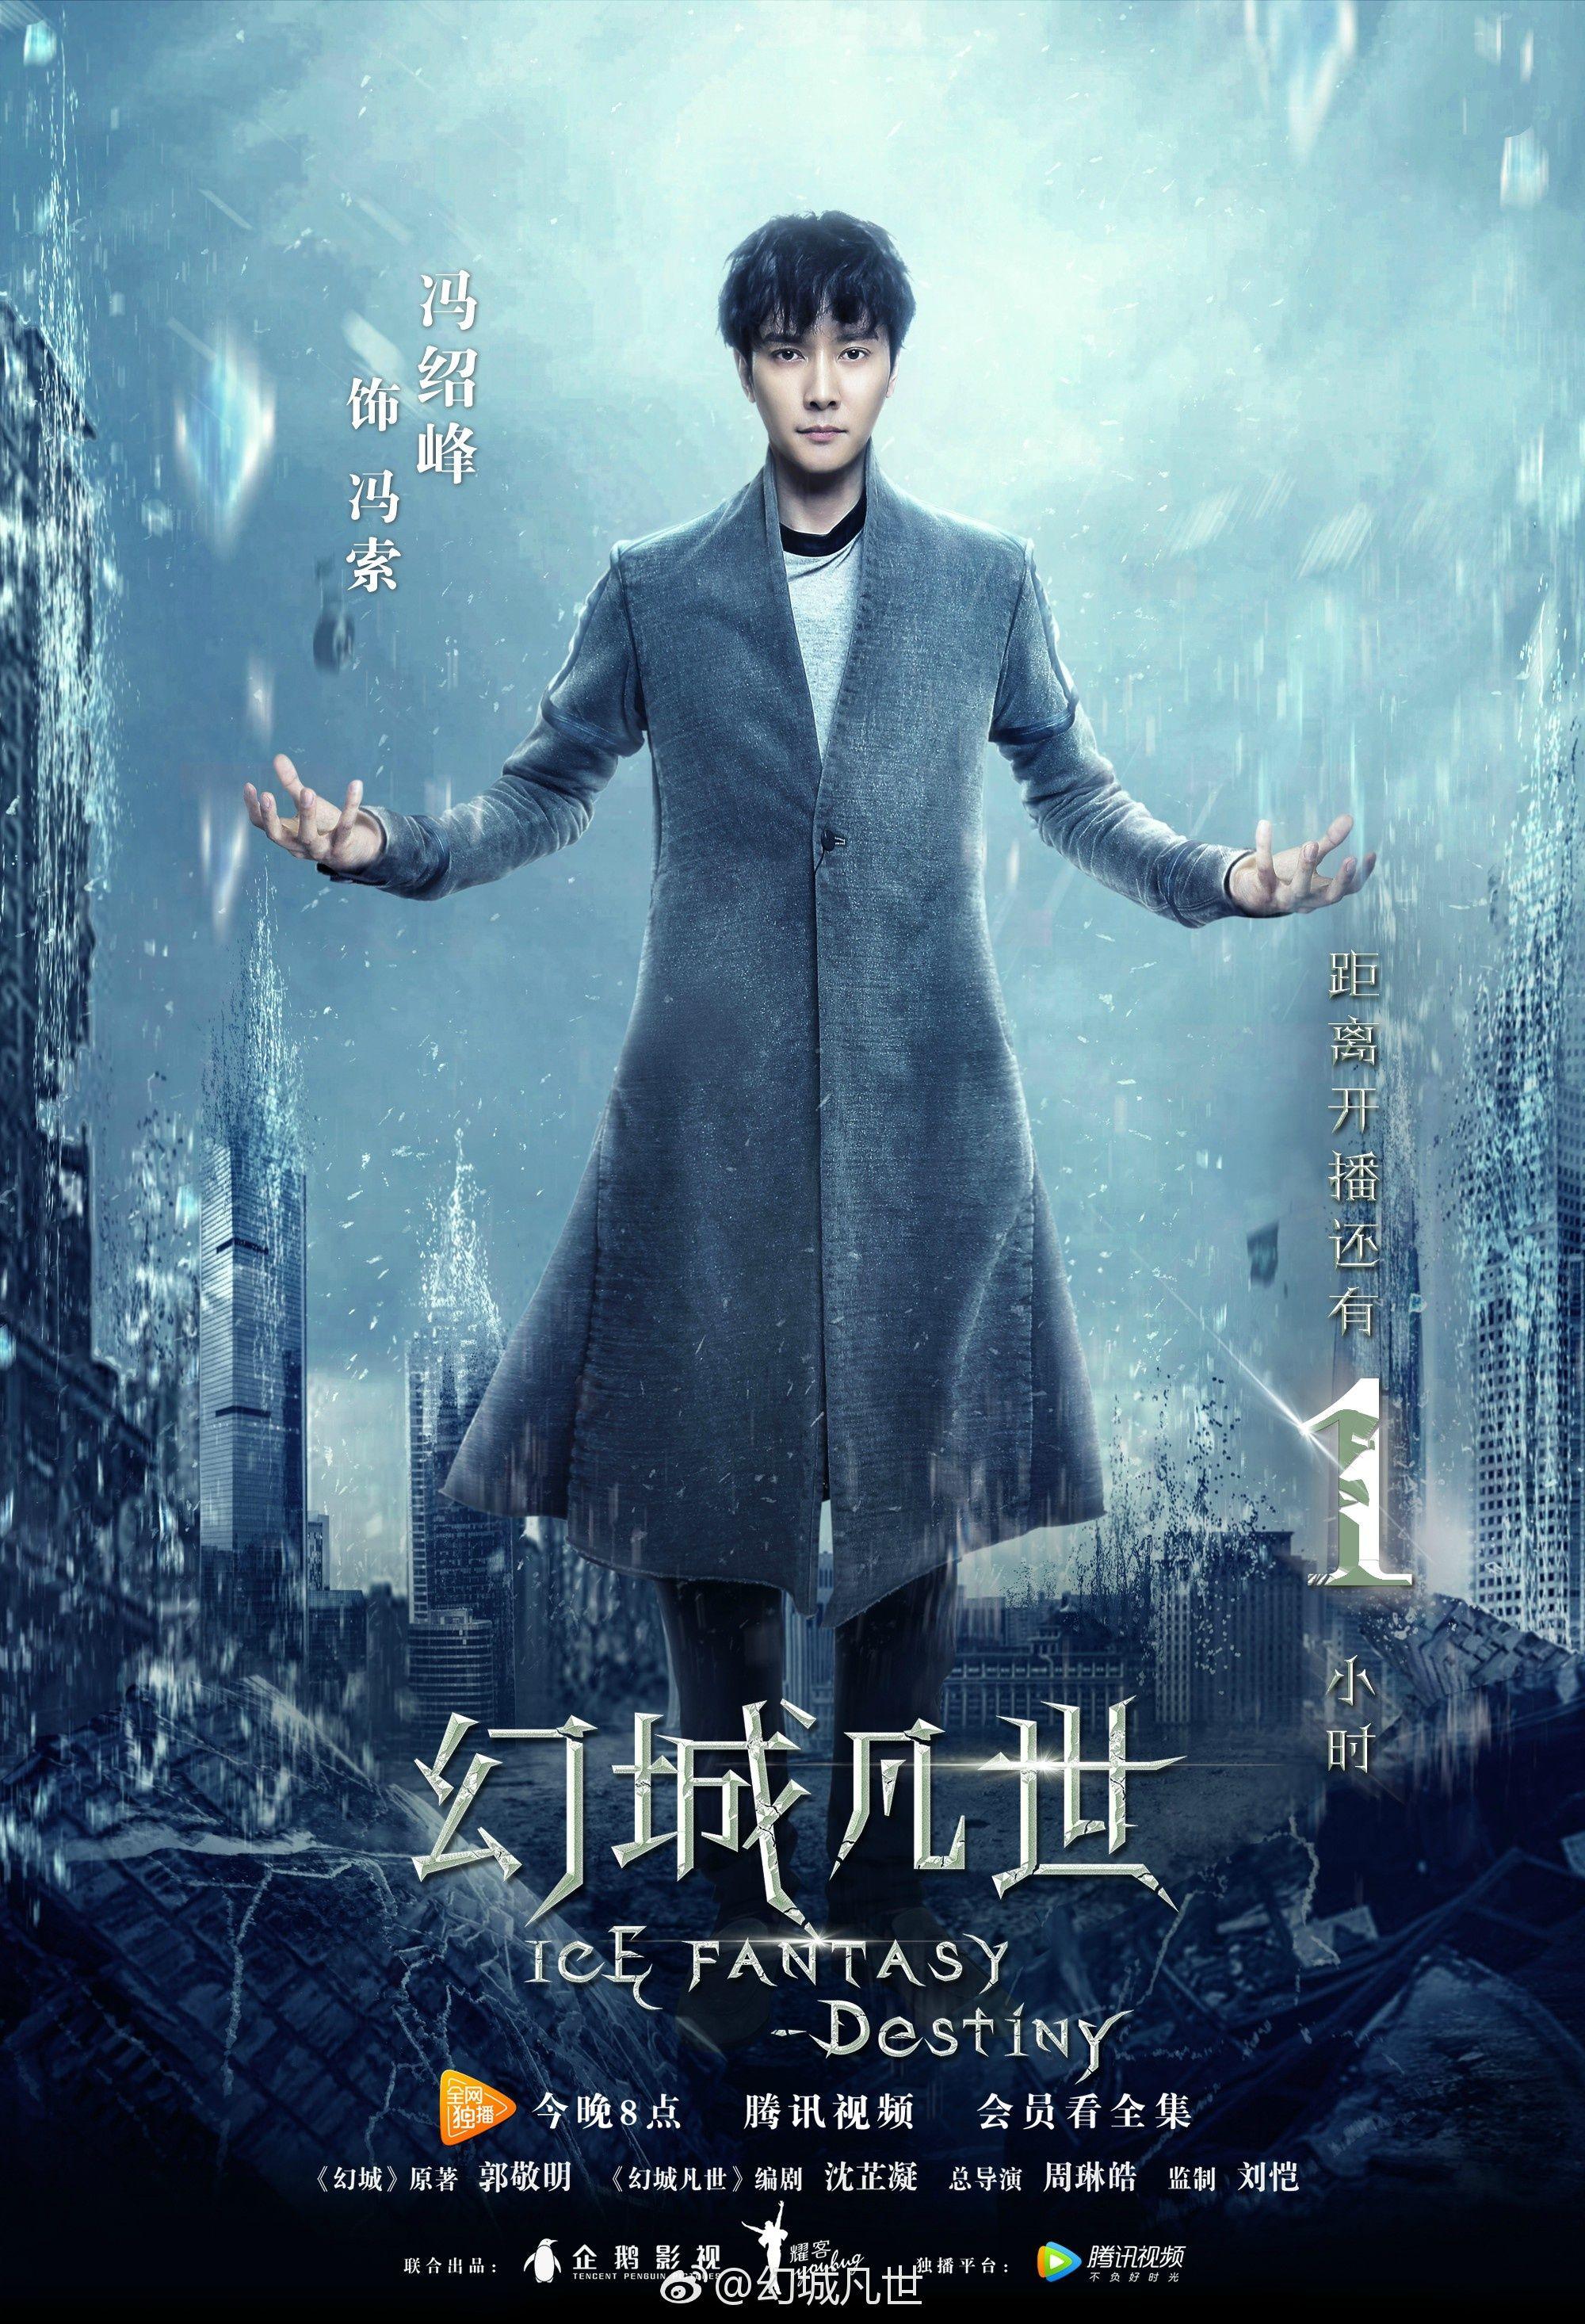 Ice Fantasy Destiny - Feng Suo - Feng Shao Feng | Vương Quốc Ảo